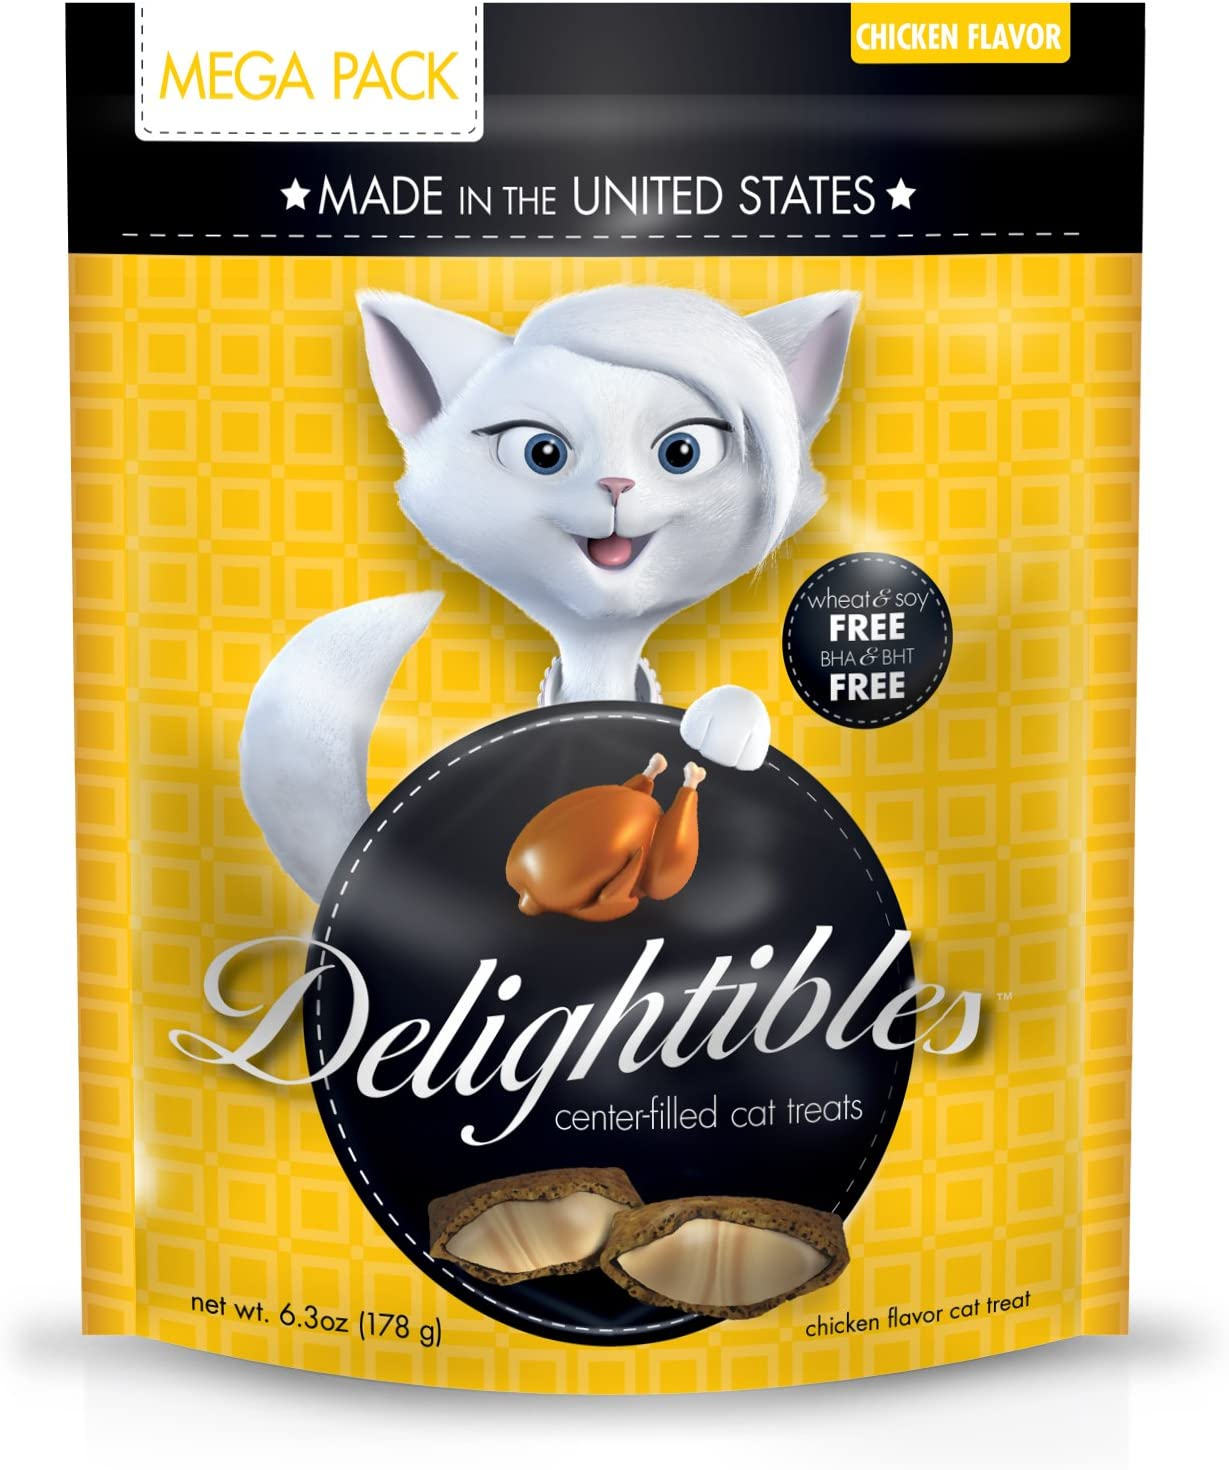 Delighitbles Center-Filled Gourmet Cat Treats